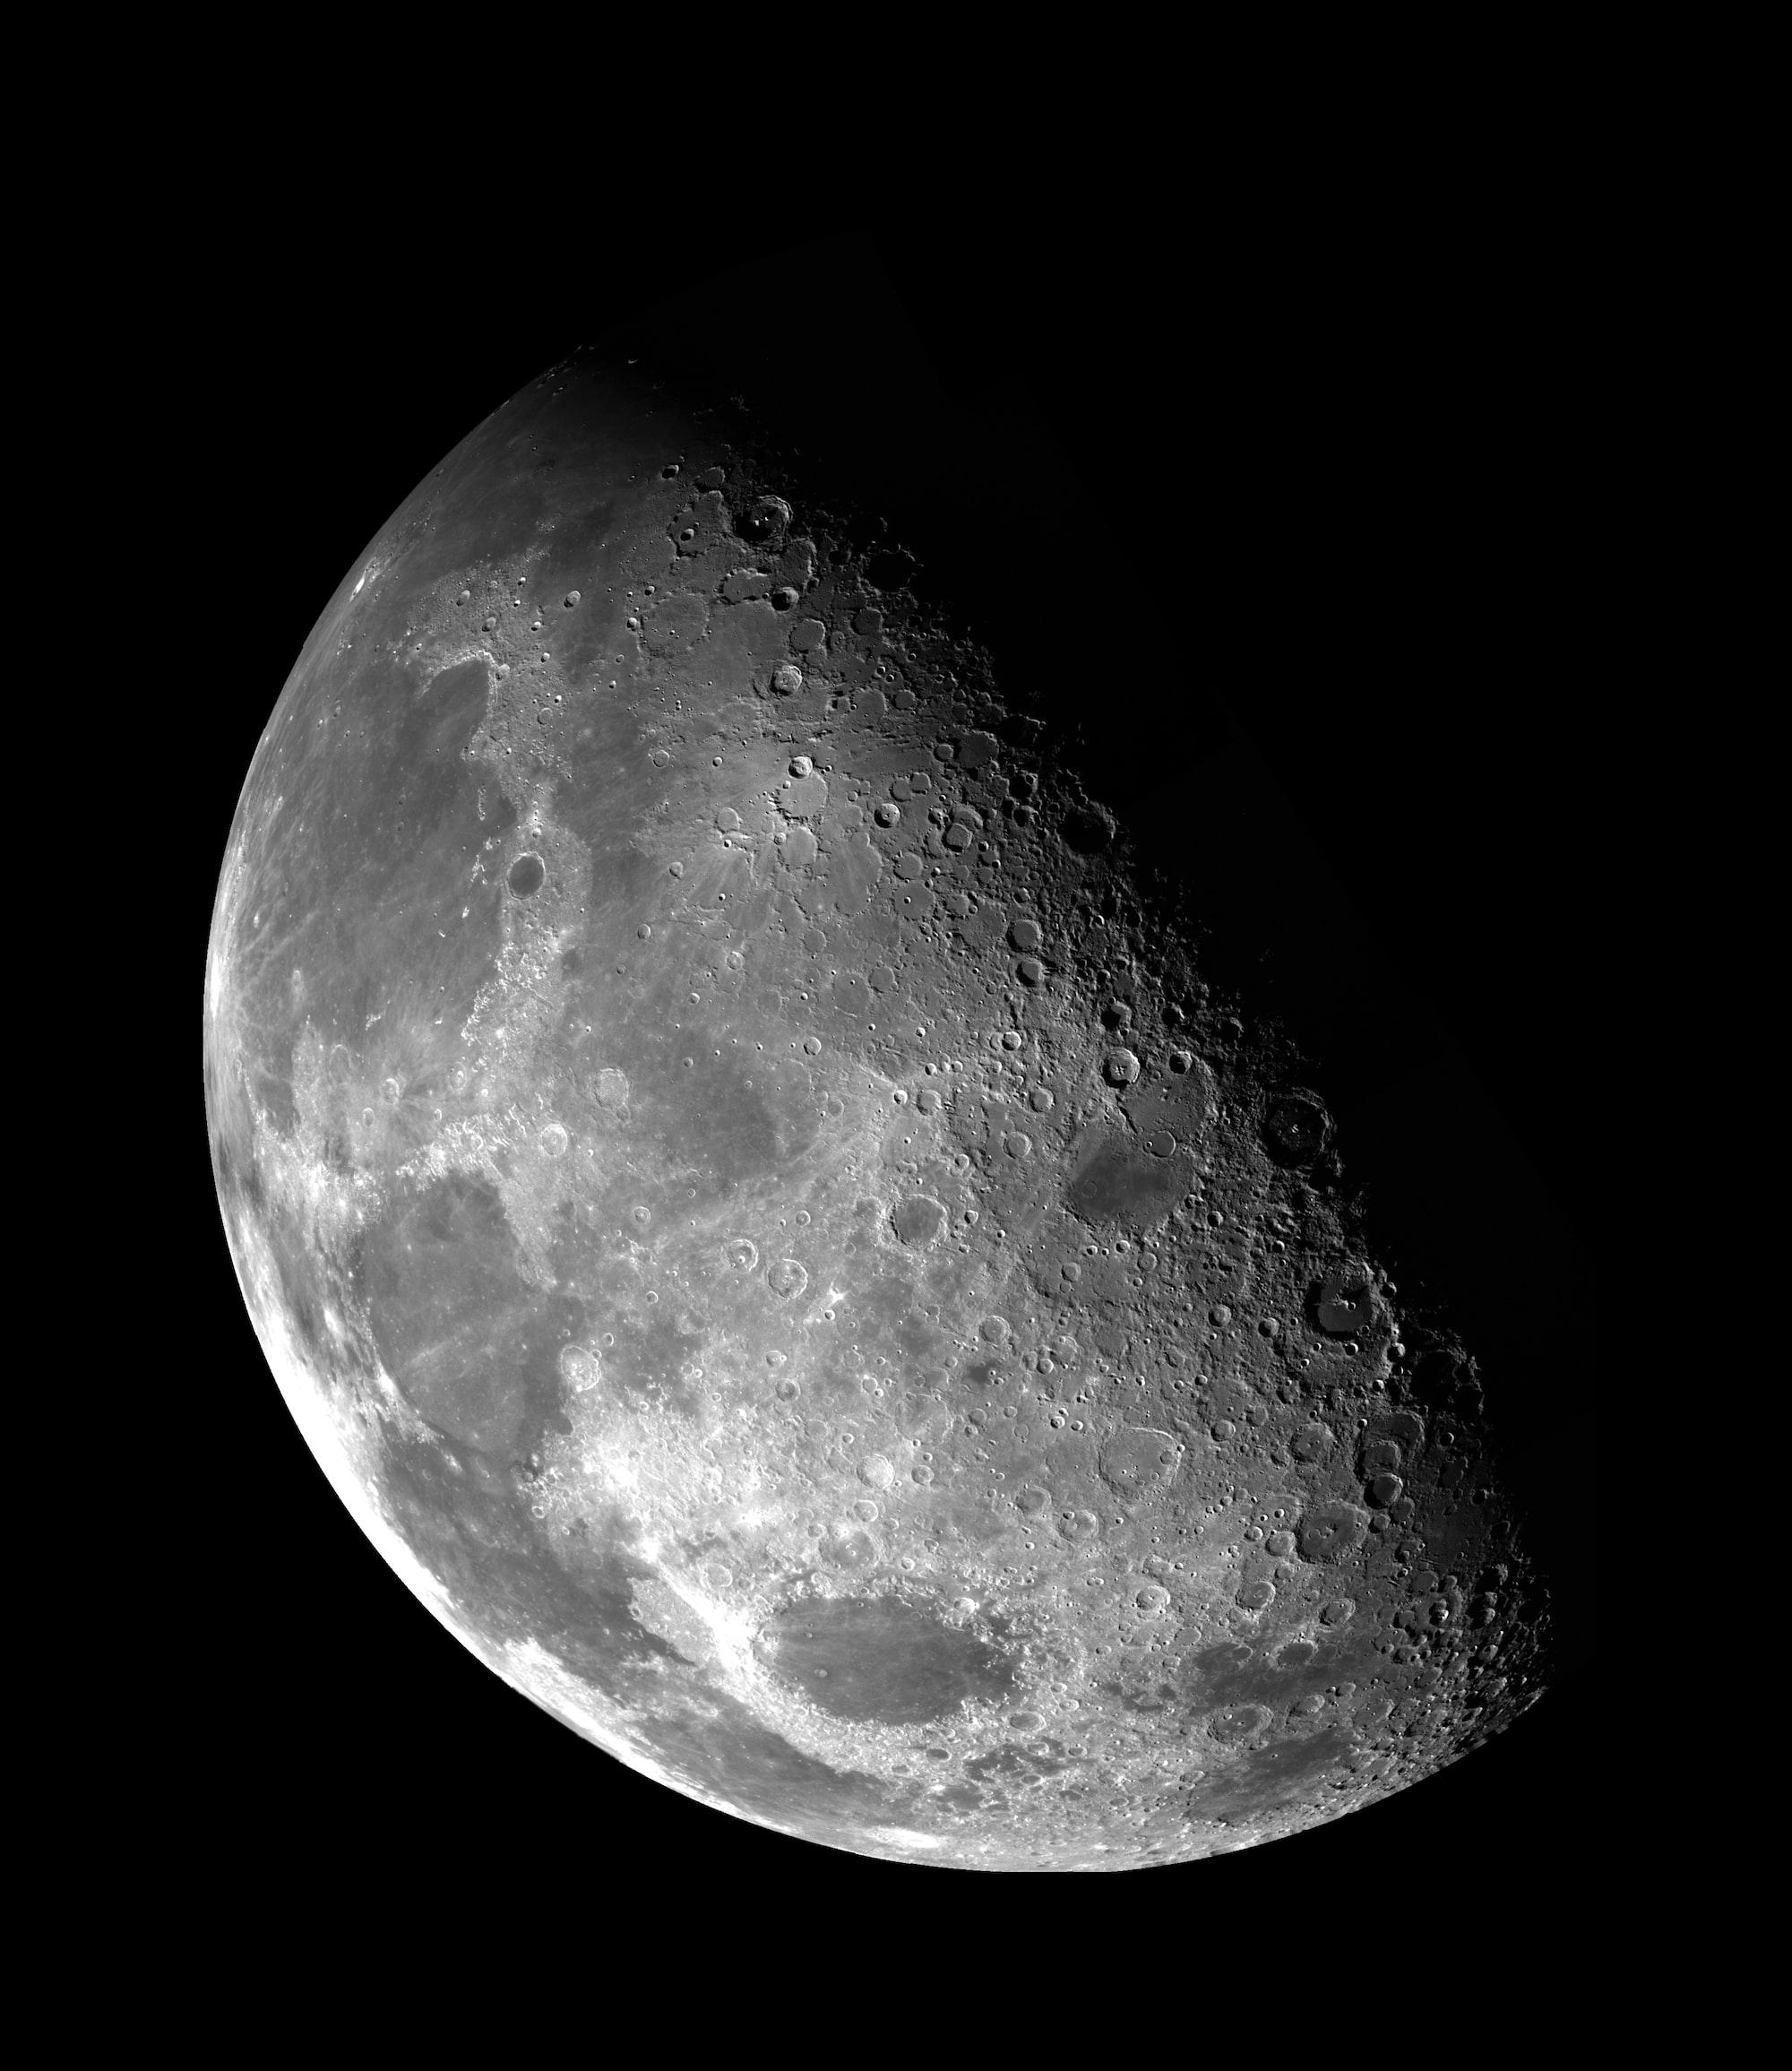 Moon crater close-up